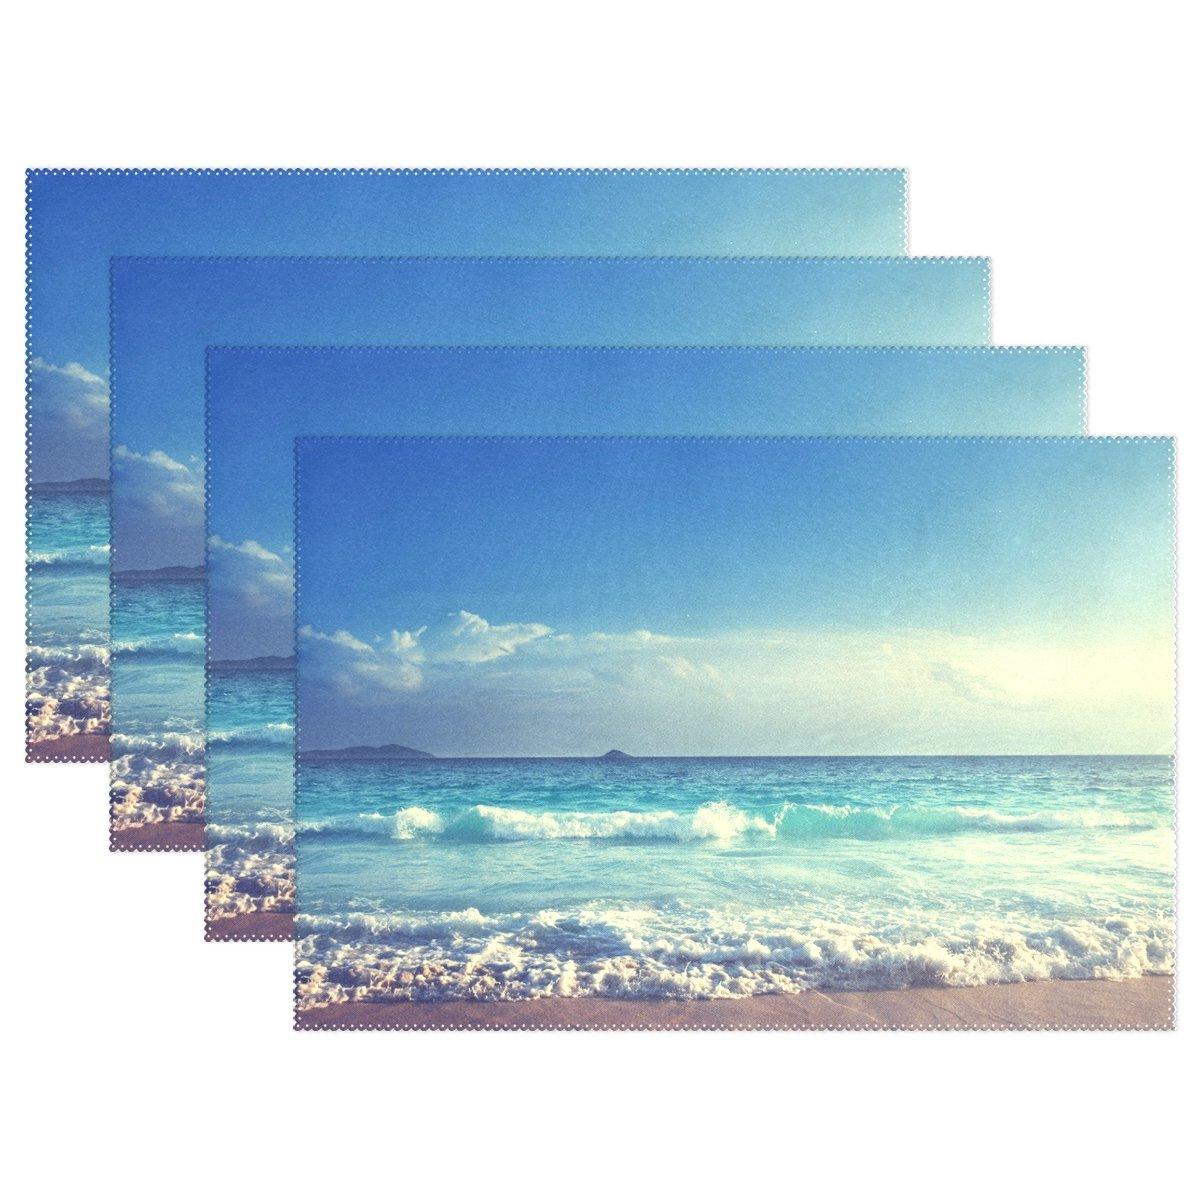 WozoヴィンテージブルーSky Ocean Wave Seaプレースマットテーブルマット12